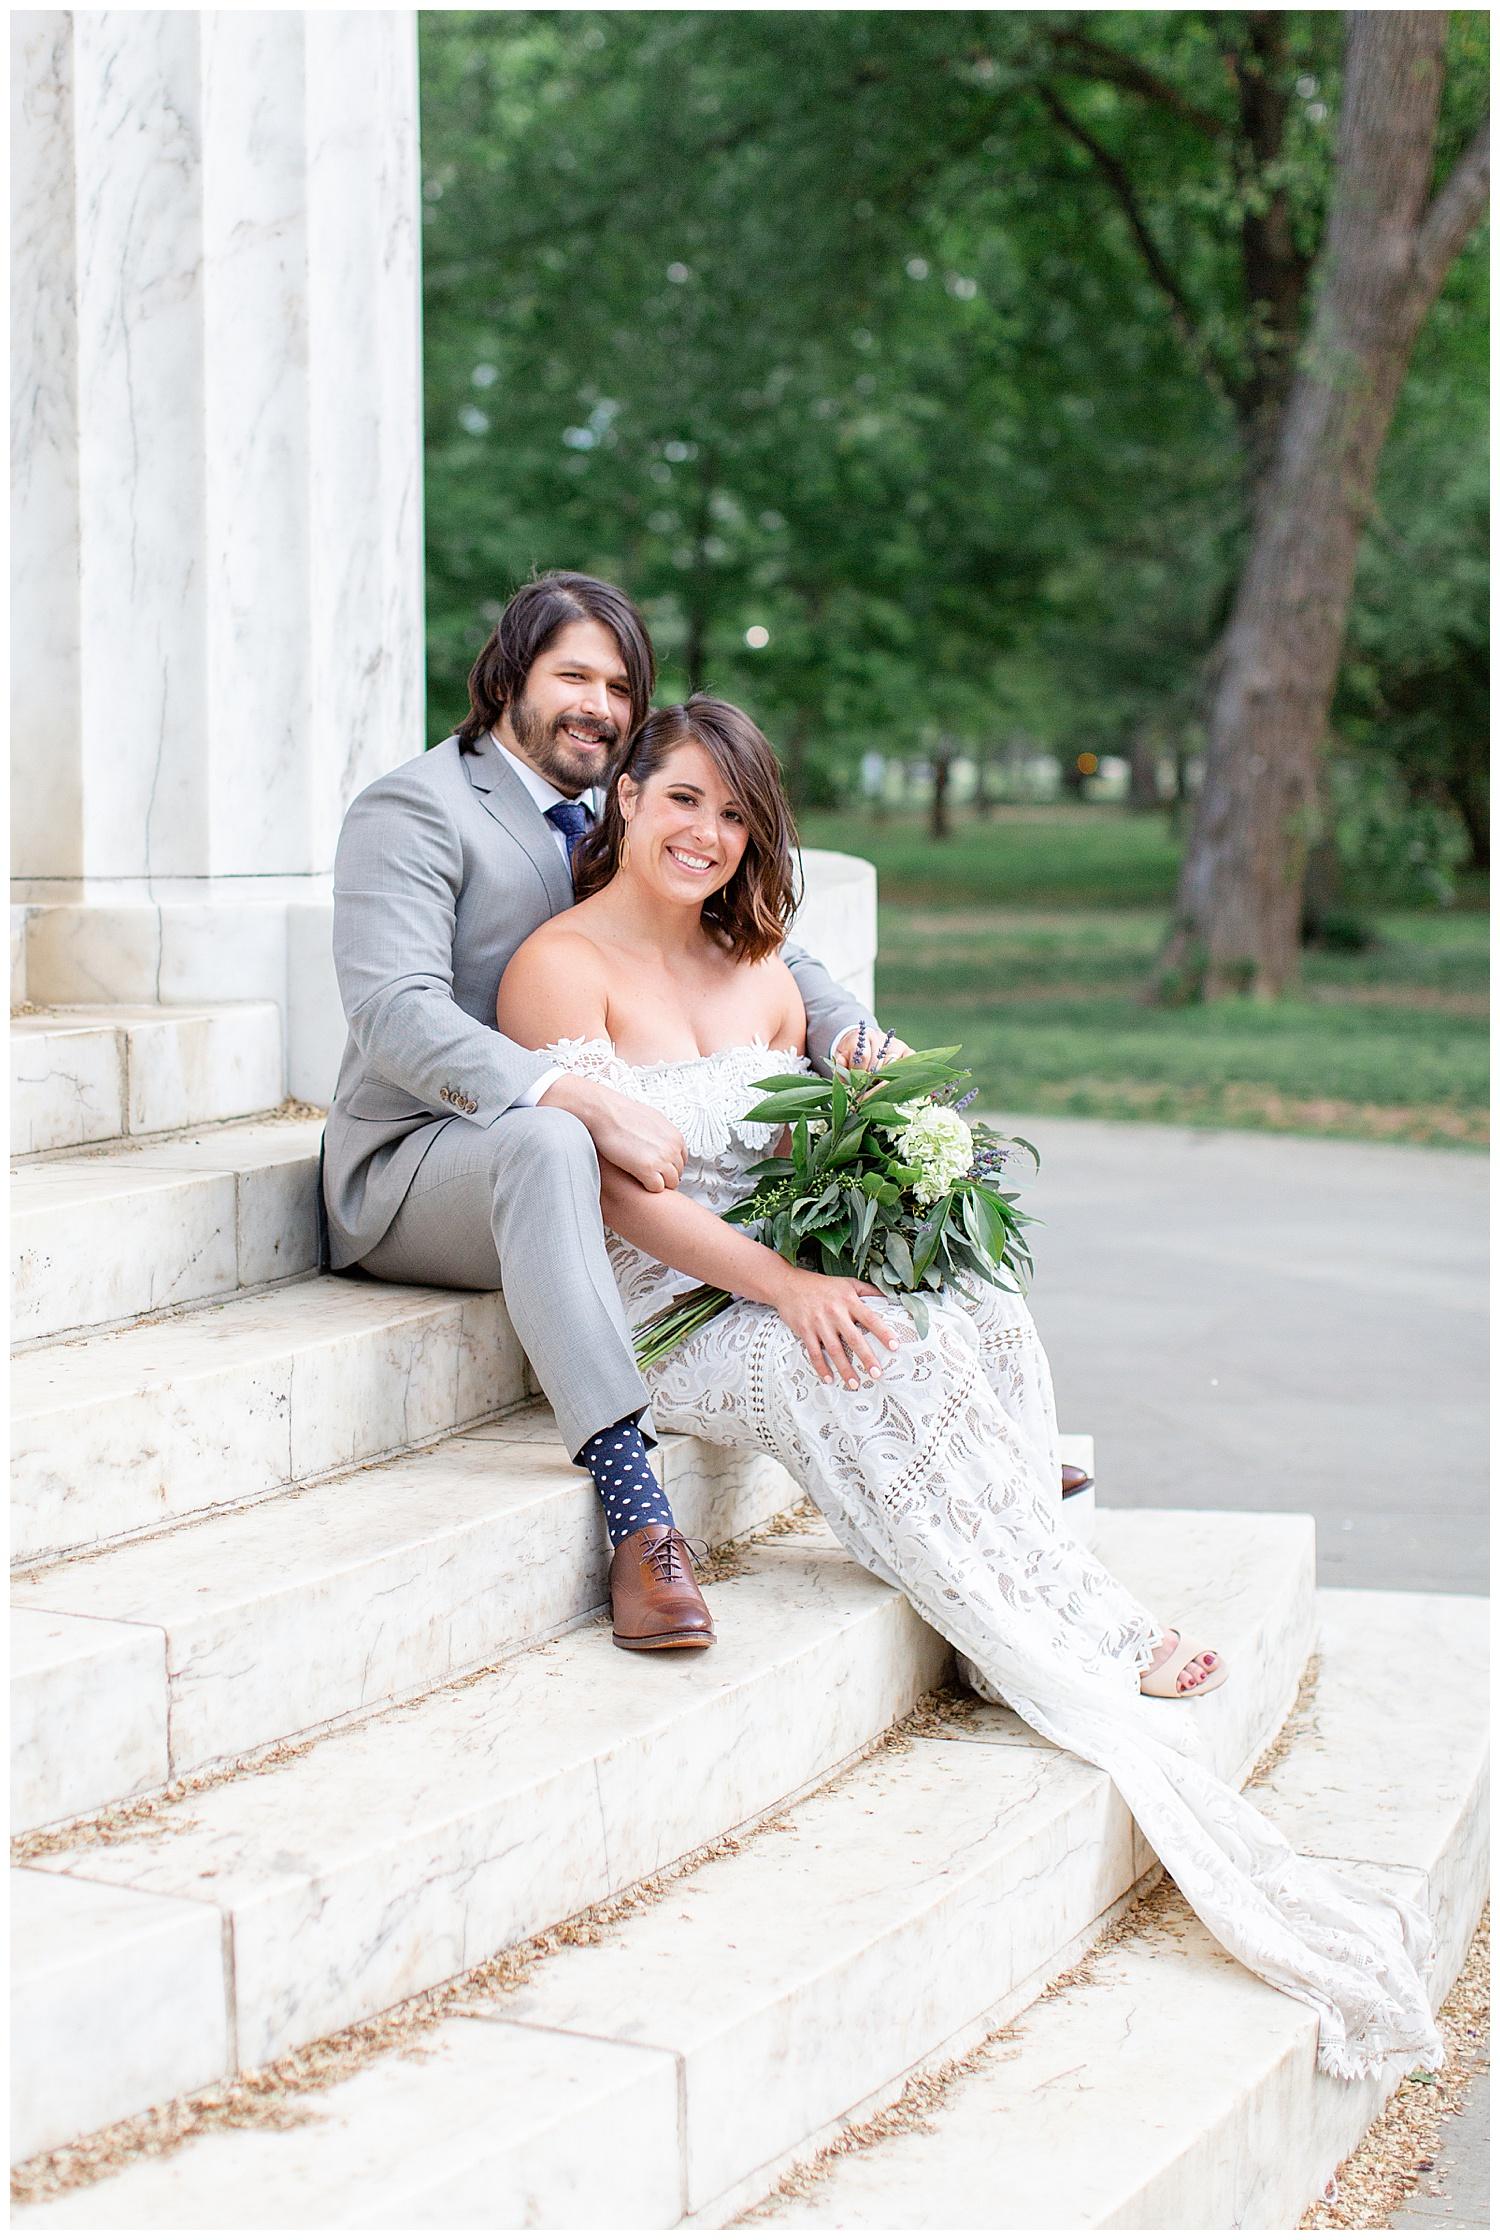 emily-belson-photography-washington-dc-wedding-24.jpg